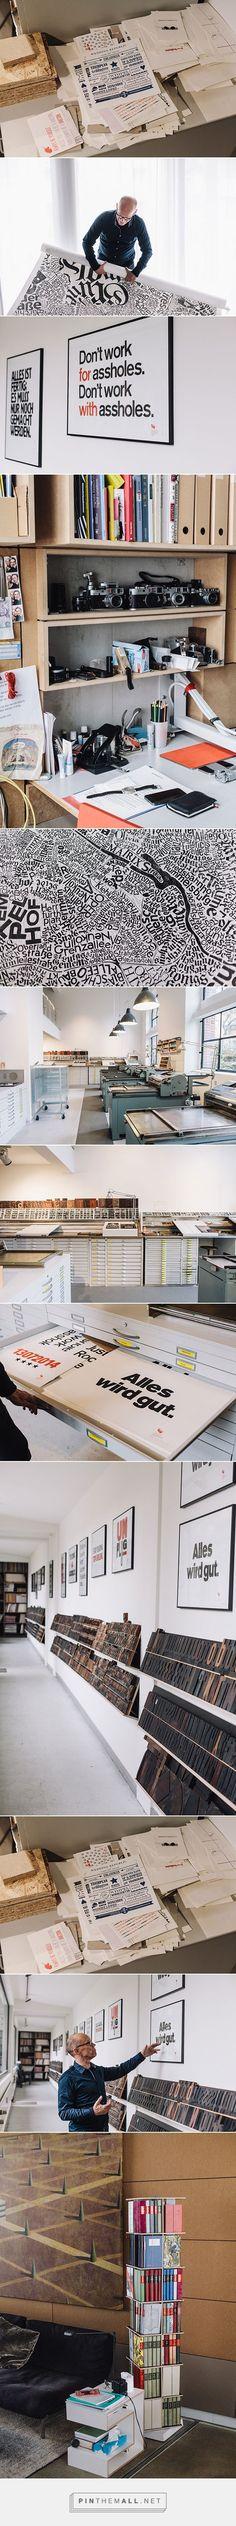 It's Nice That : Looking into Erik Spiekermann's home and studio on Freunde von Freunden - created via http://pinthemall.net